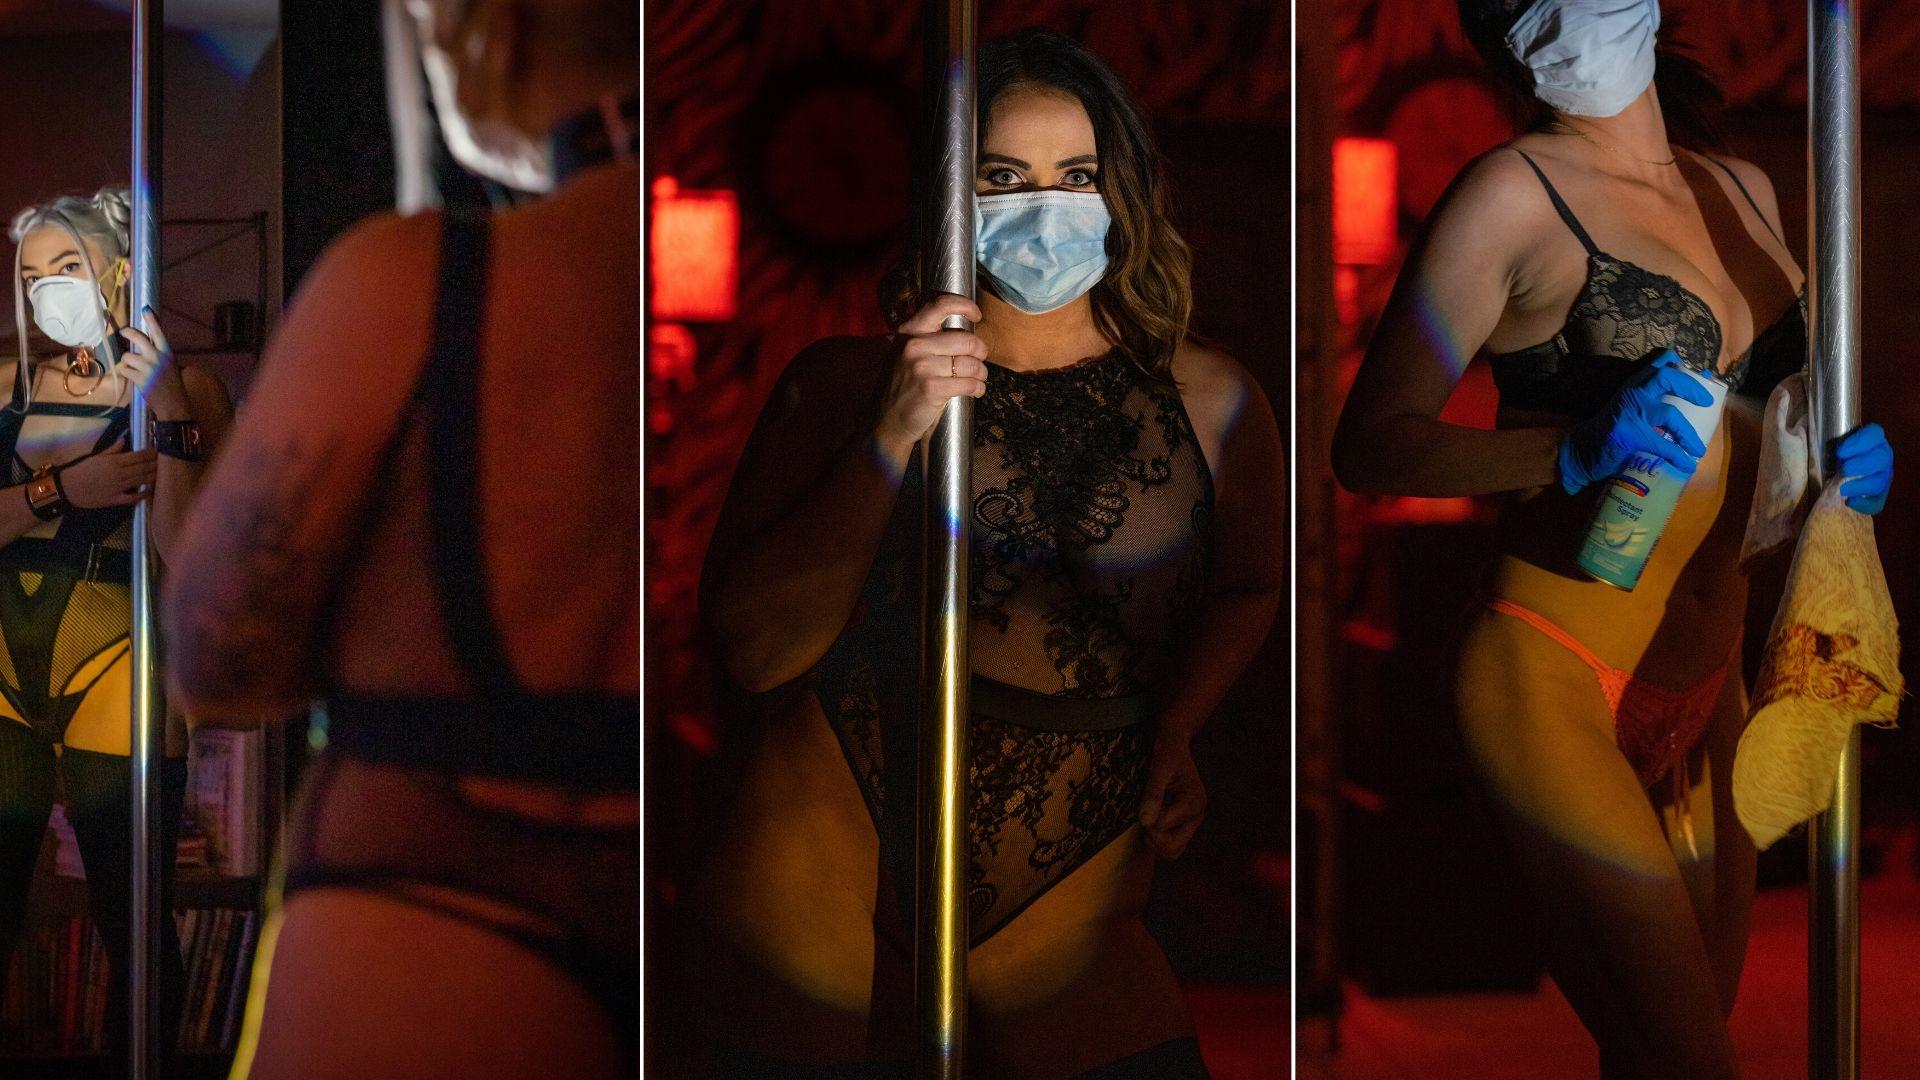 Na sluitingstijd stoeien in stripclub